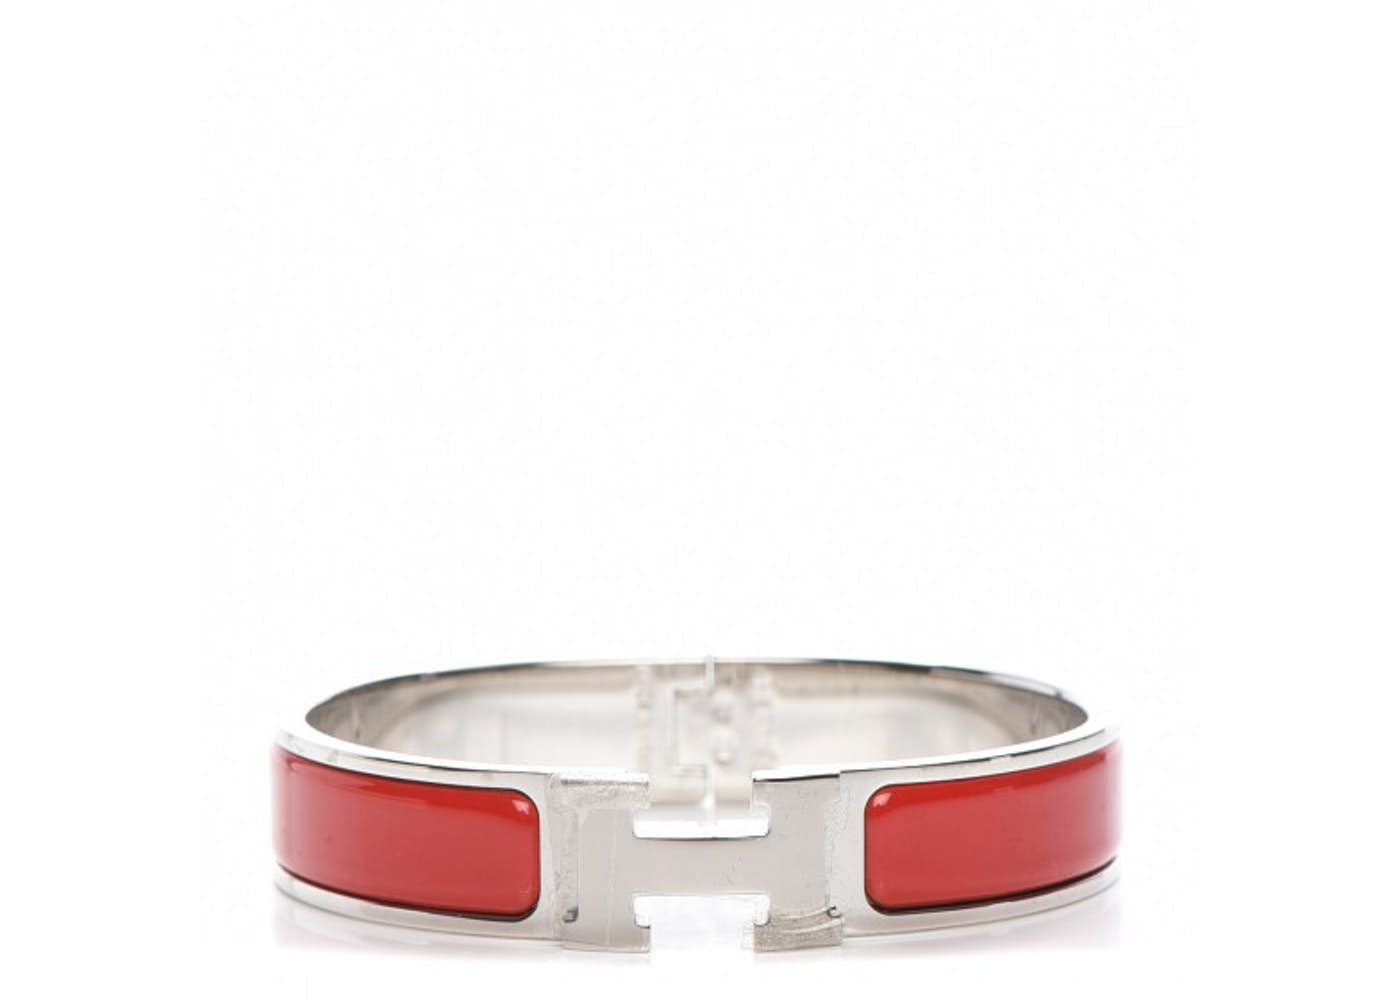 hermes bracelet narrow clic clac h enamel pm. Black Bedroom Furniture Sets. Home Design Ideas